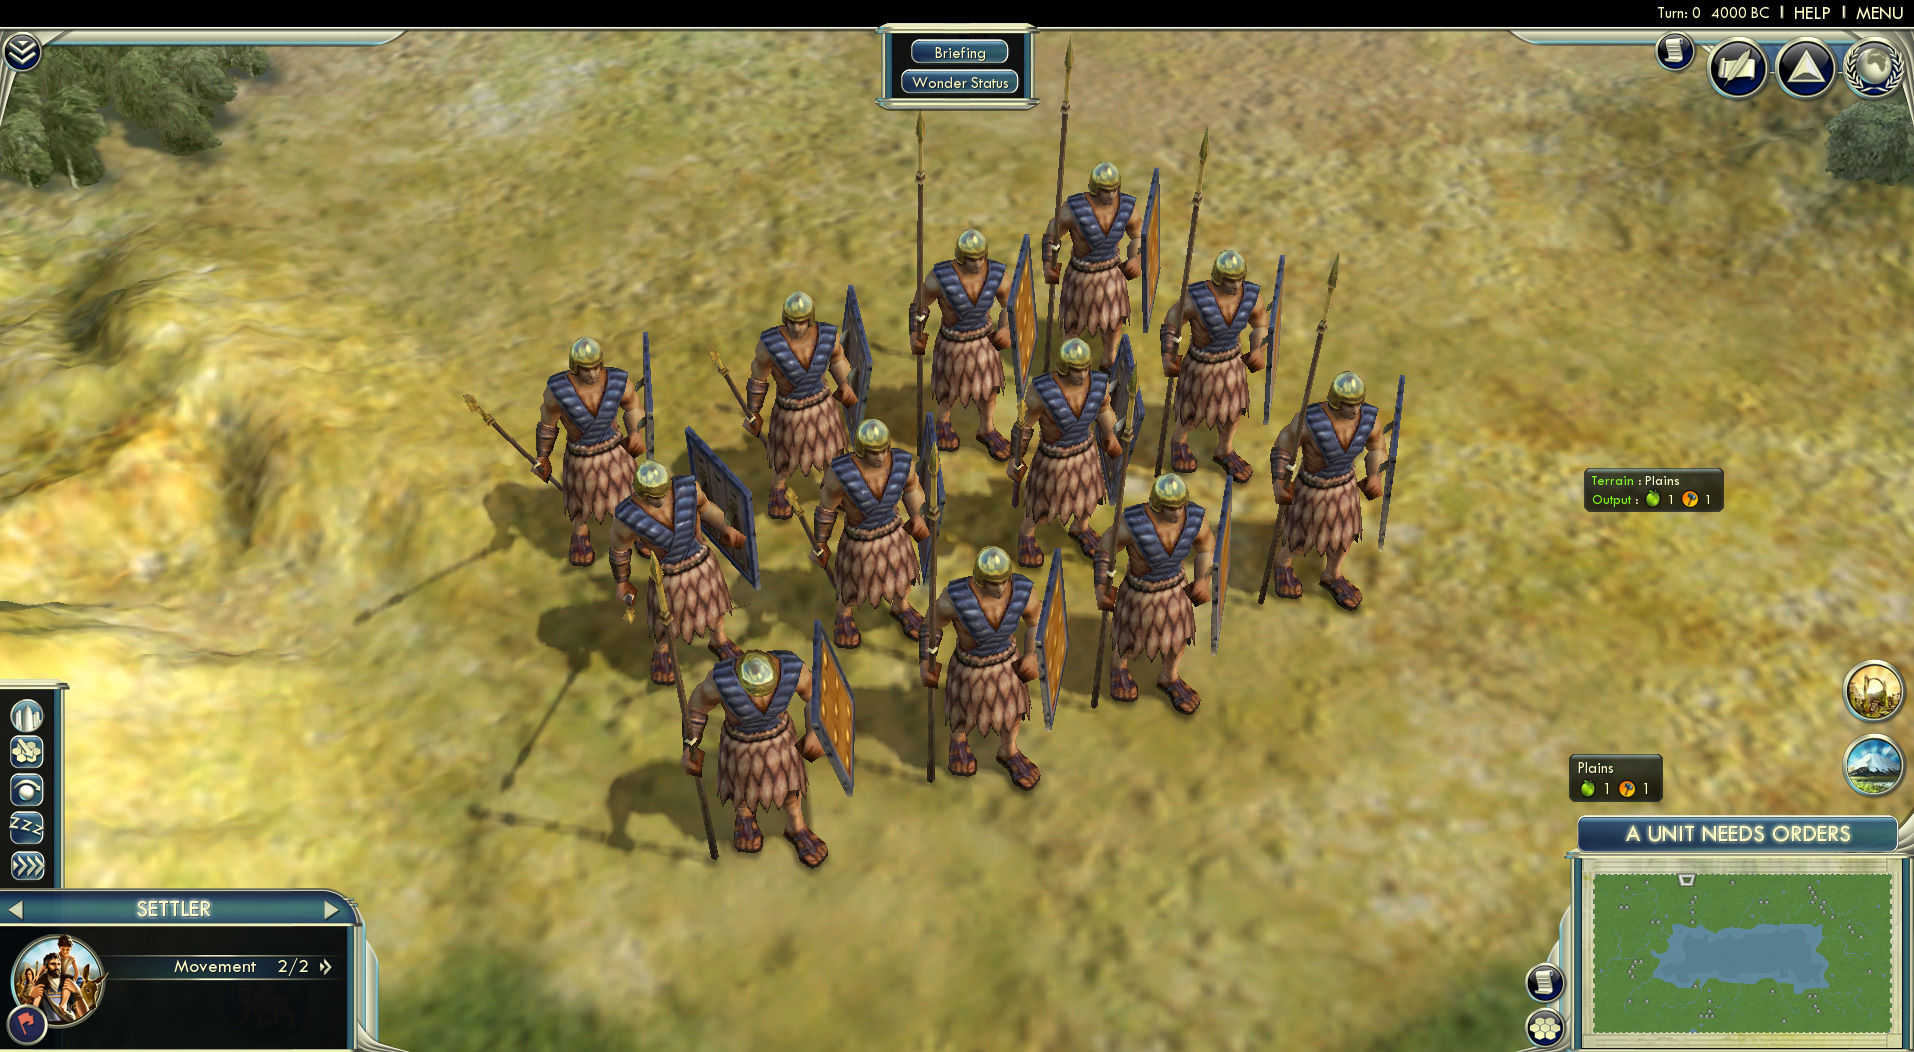 Civilization V - Scenario Pack: Wonders of the Ancient World